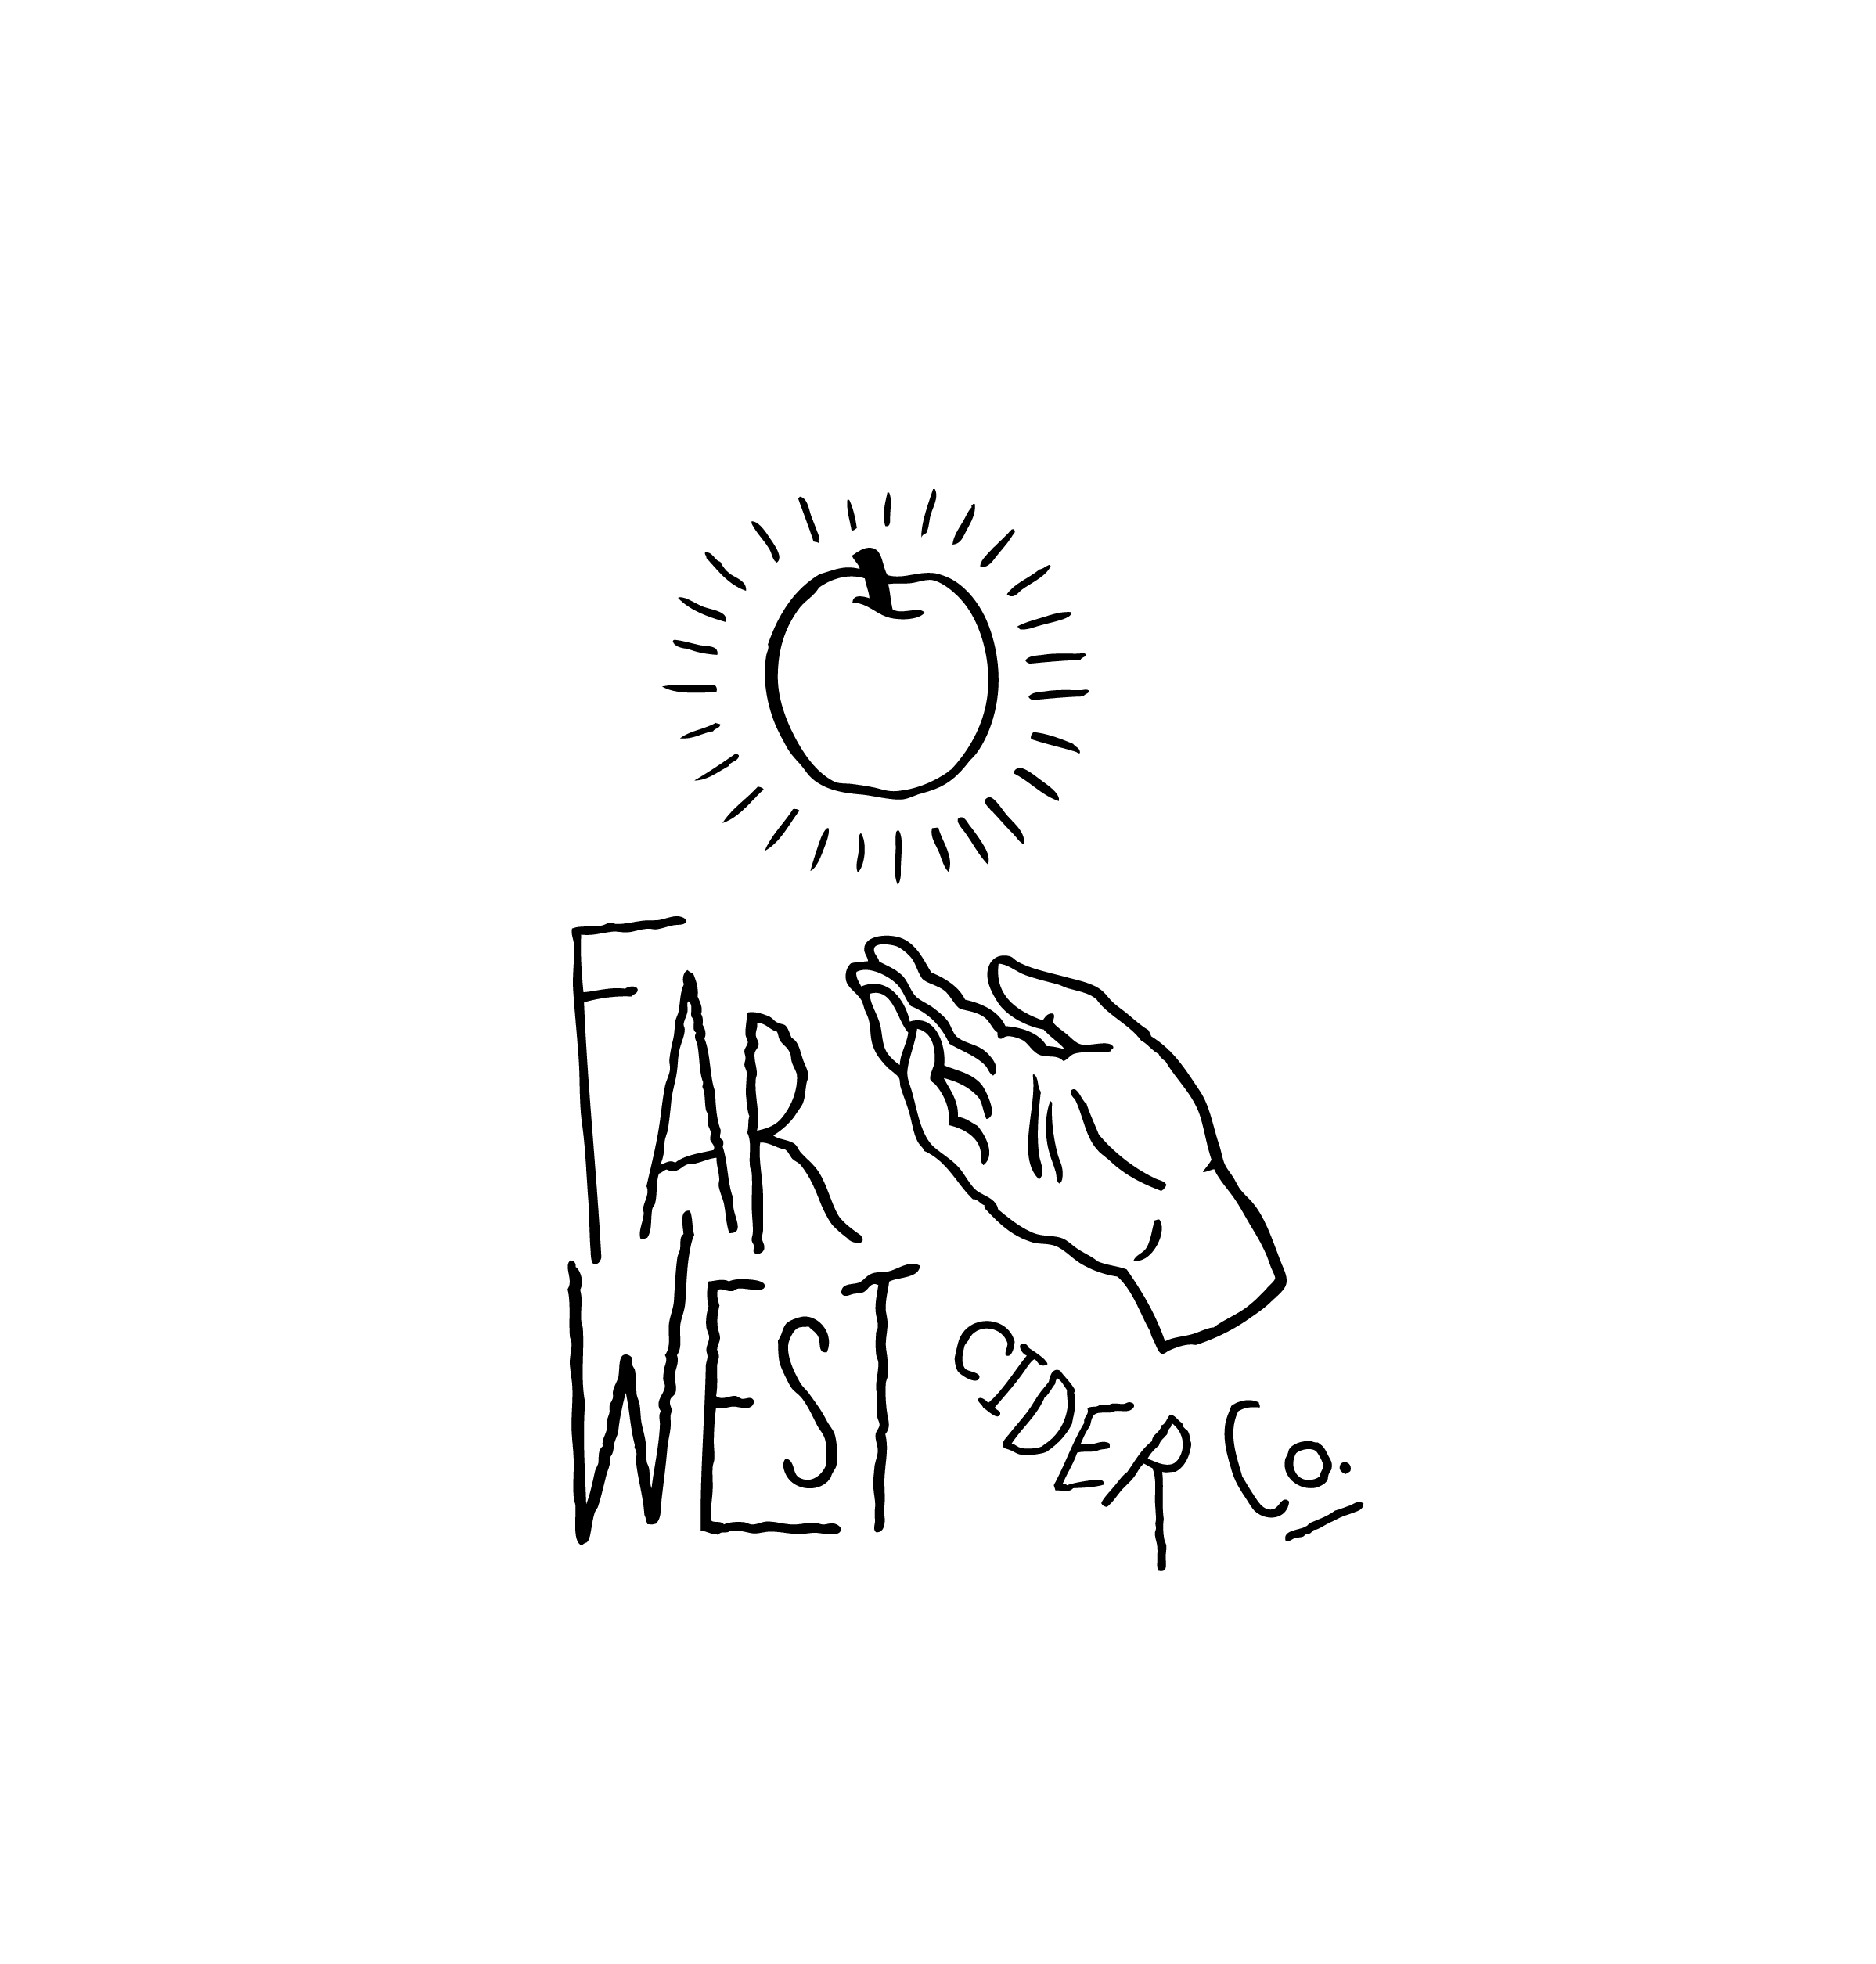 Far West BW Logo 1.6.17.png